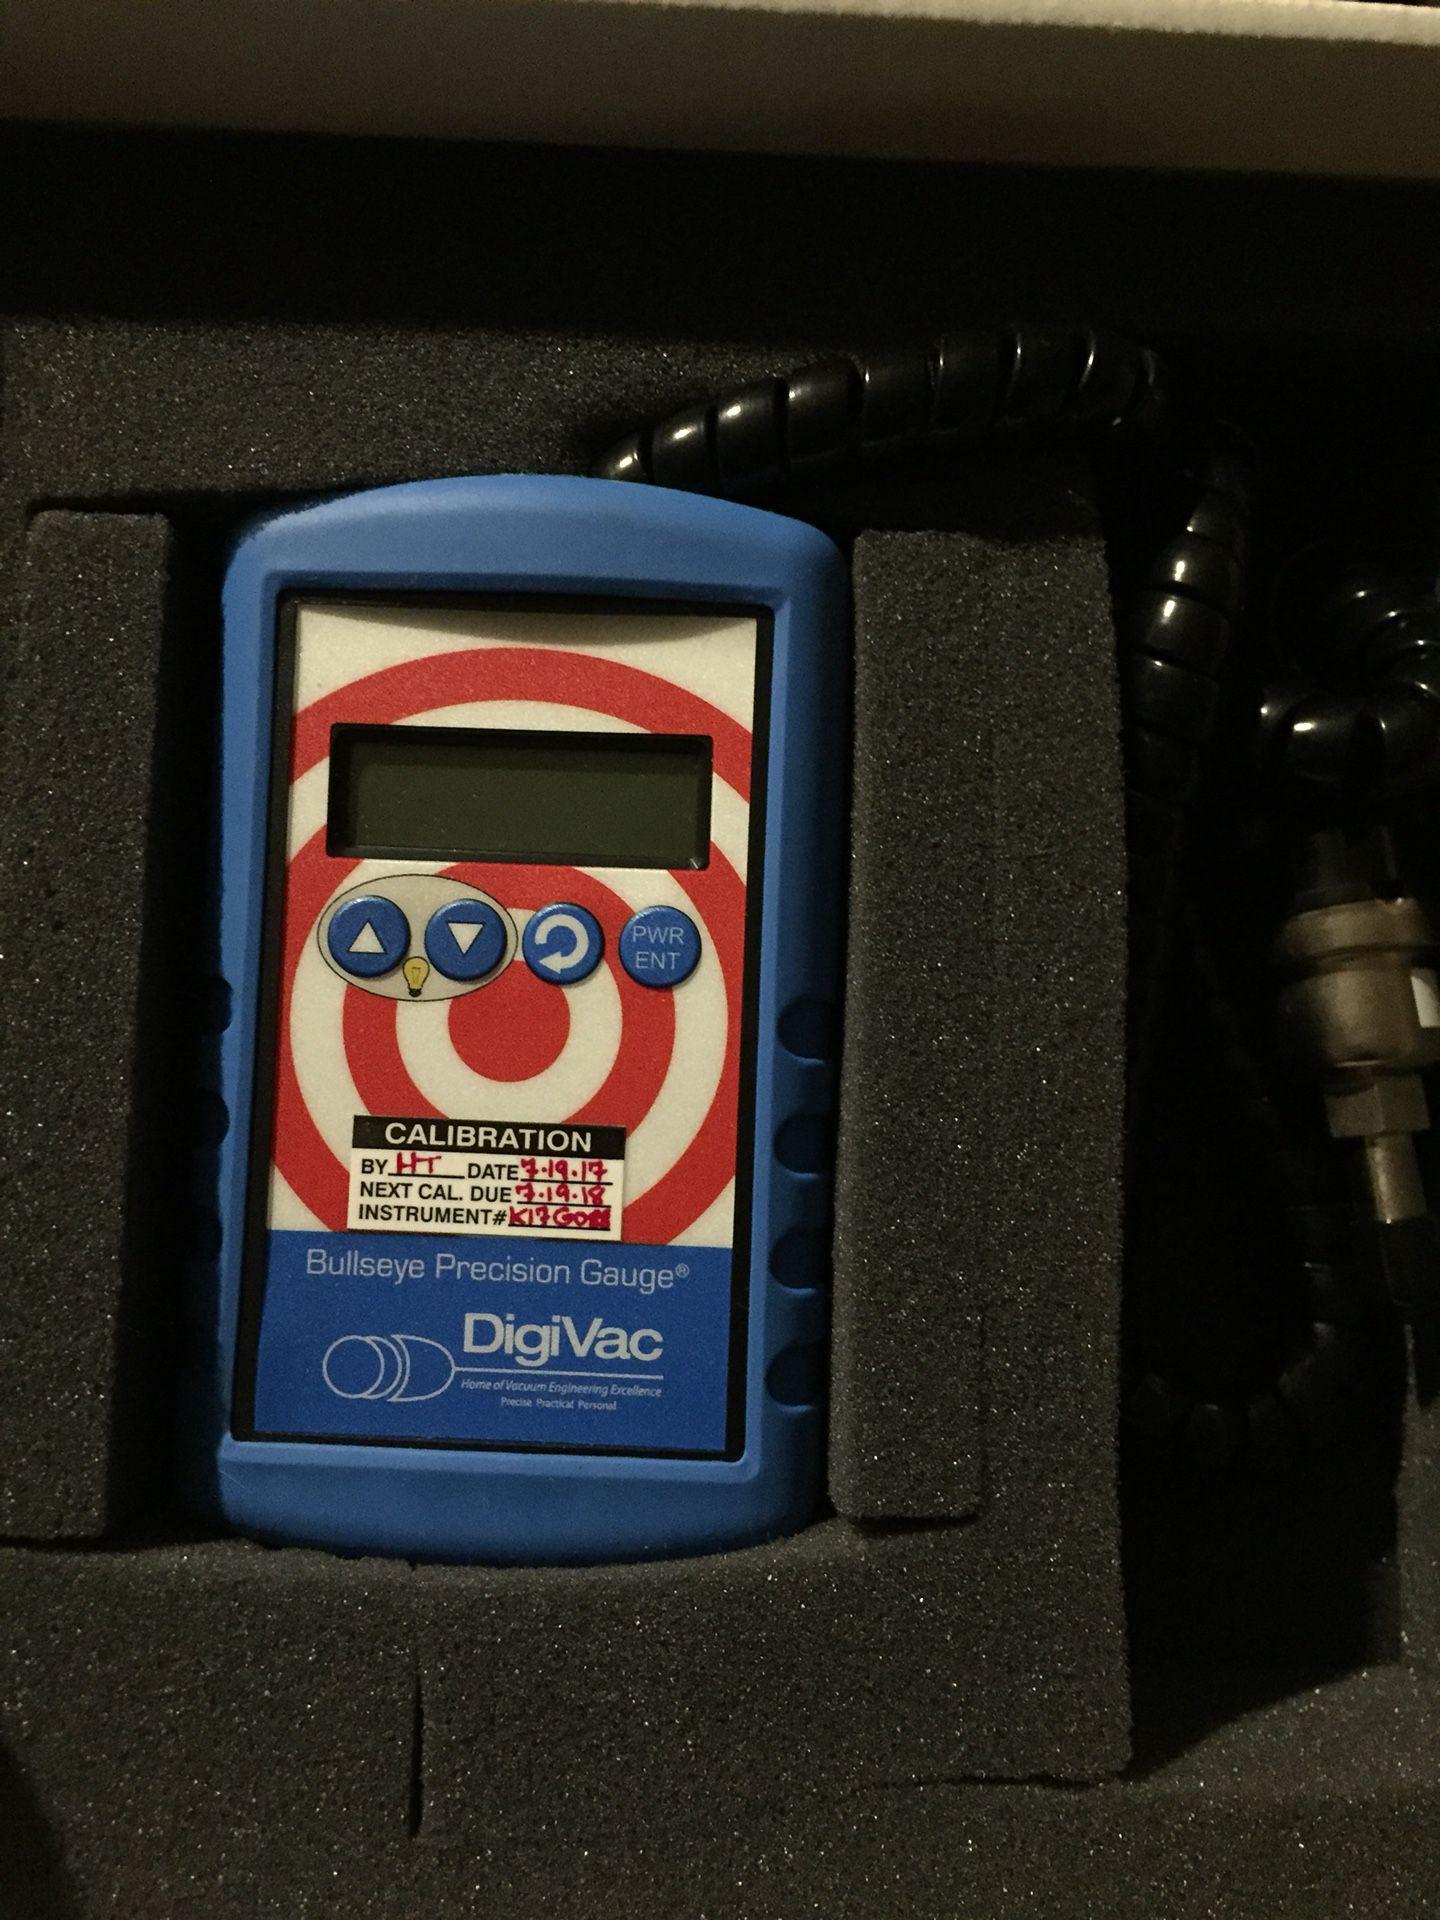 Precision gauge